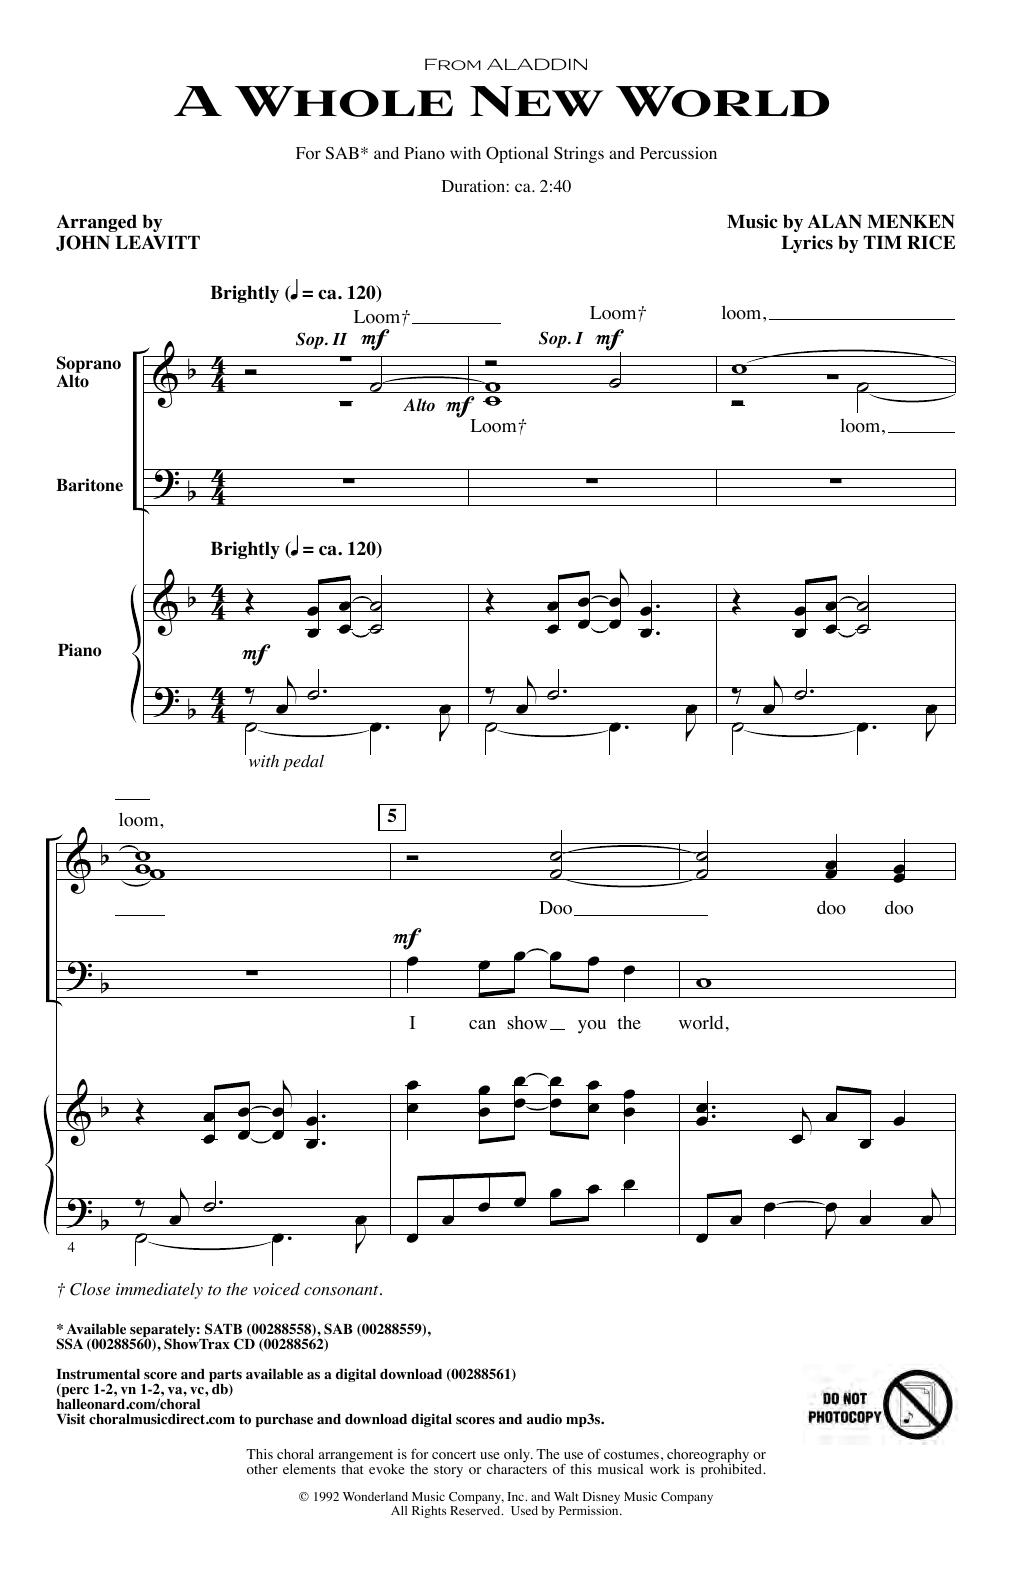 Alan Menken A Whole New World (from Aladdin) (arr. John Leavitt) sheet music notes and chords. Download Printable PDF.